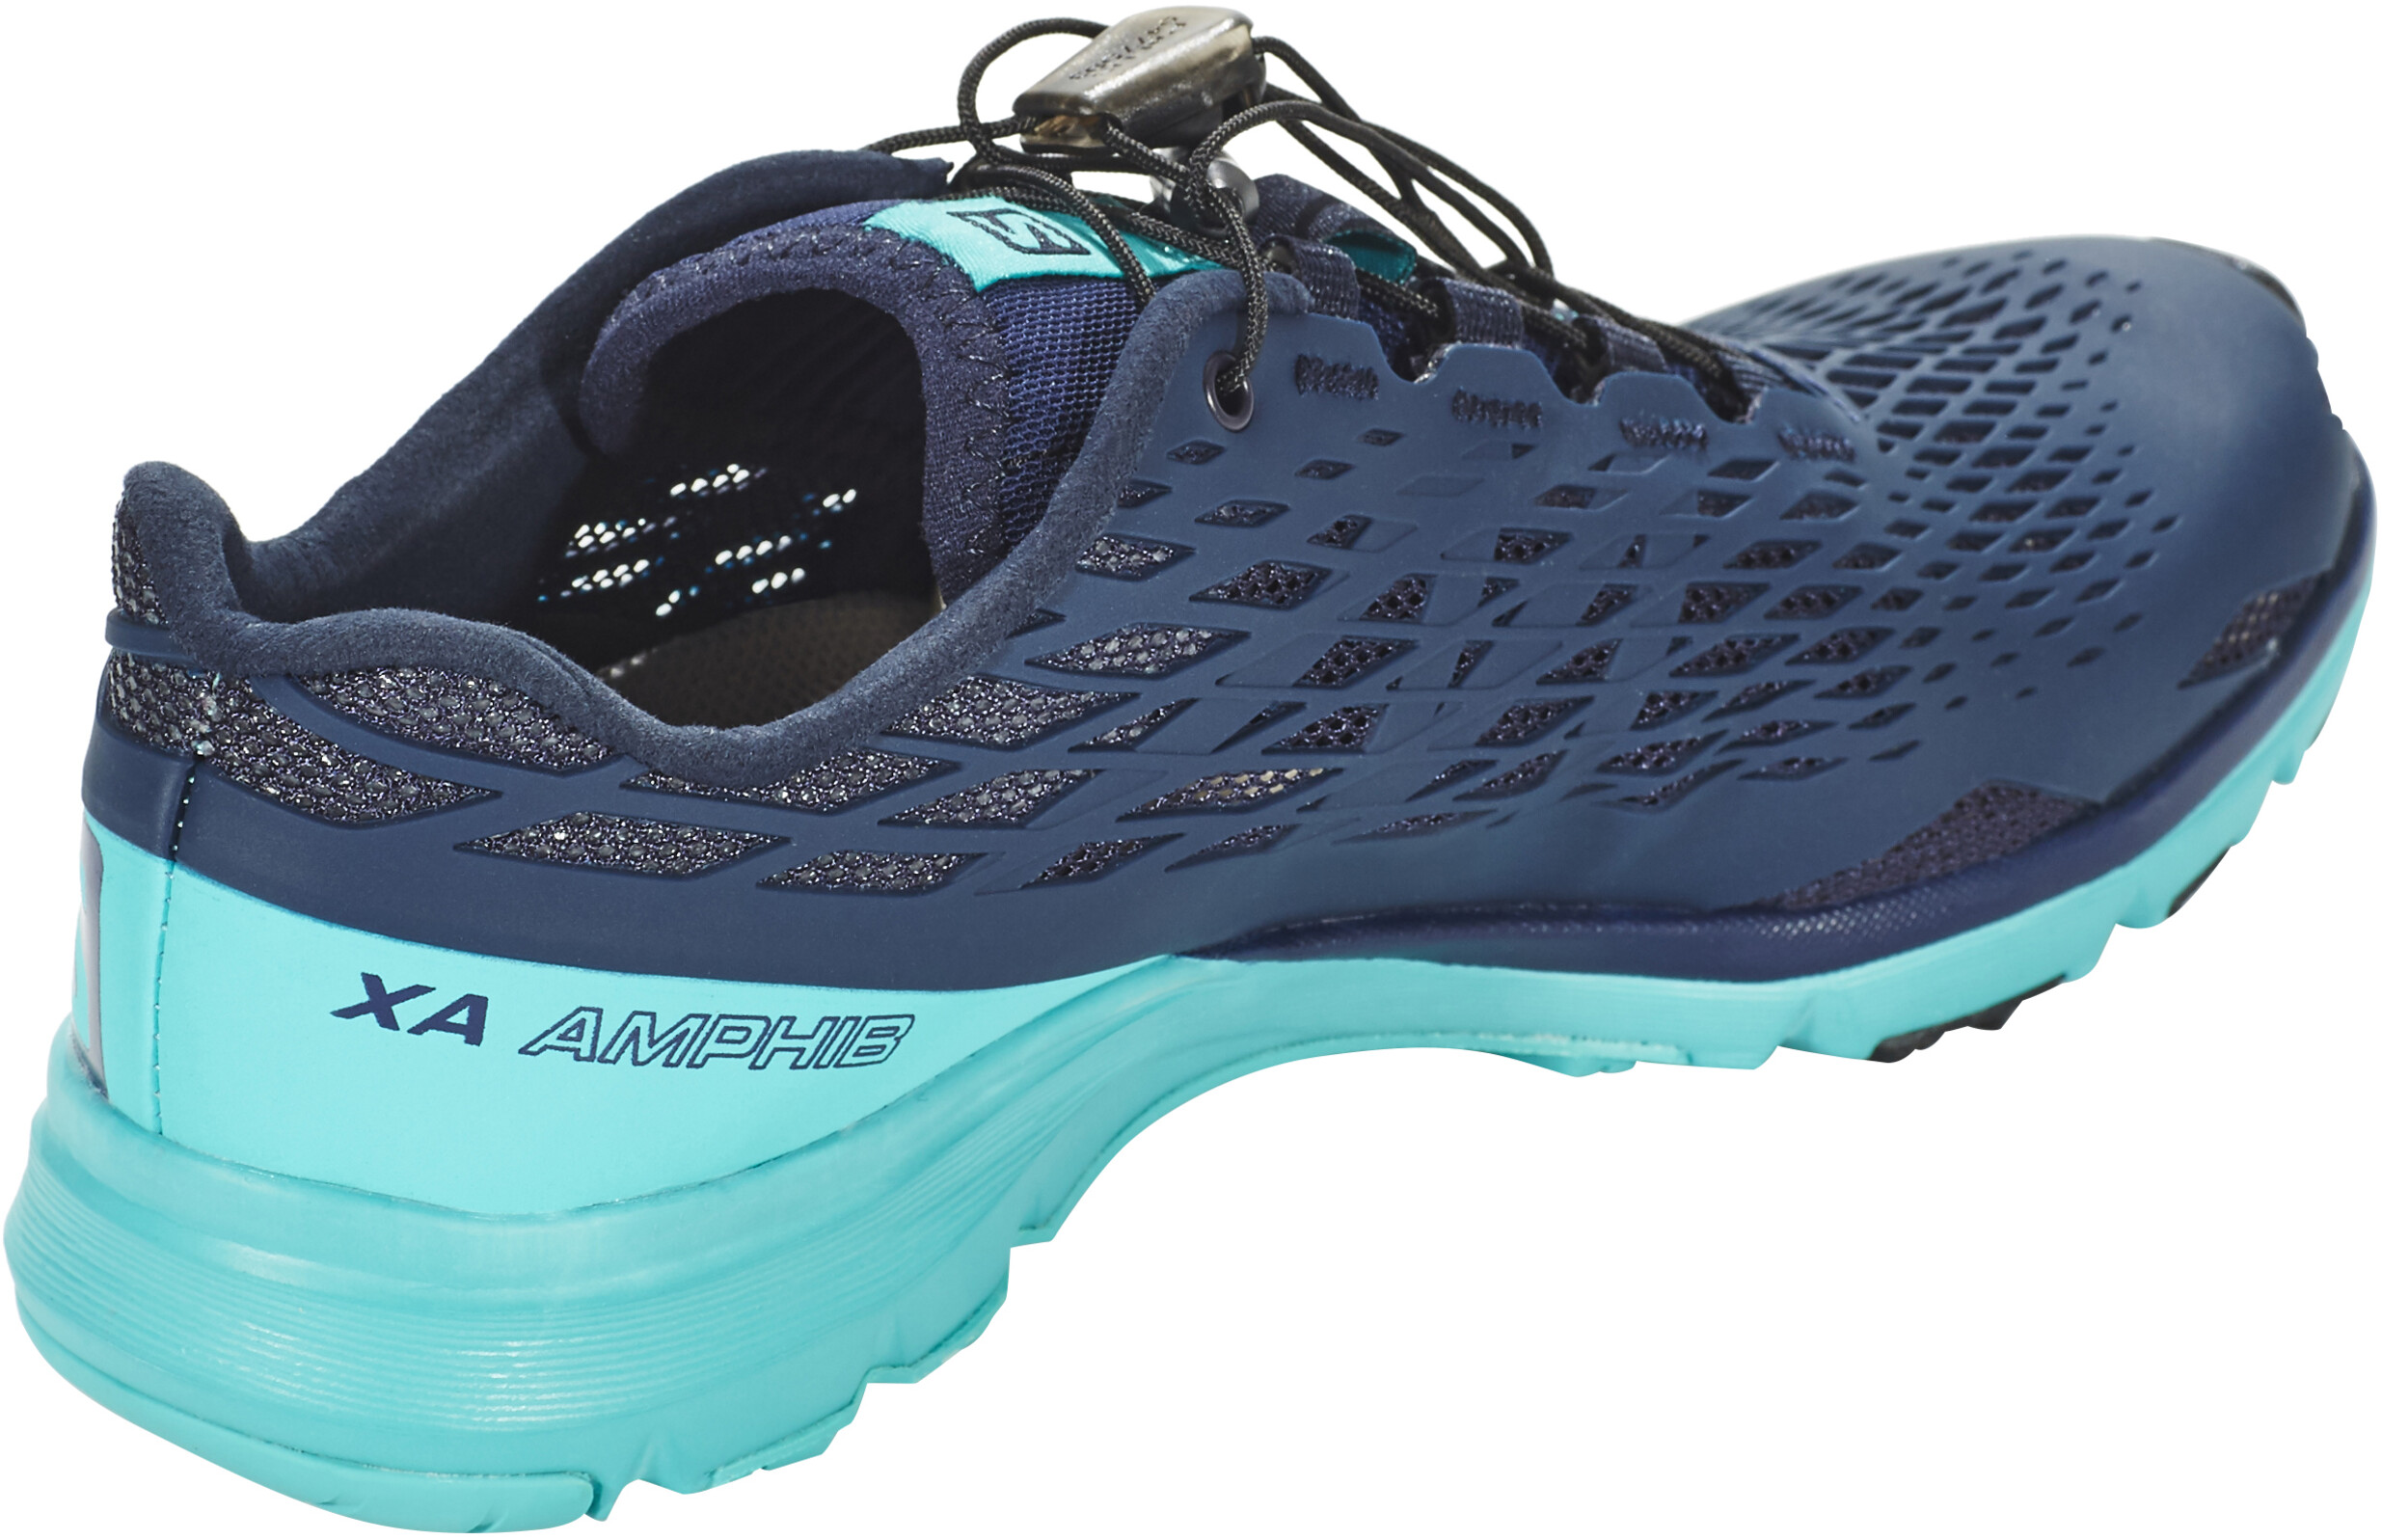 c642c351be37 Salomon XA Amphib Shoes Women blue at Addnature.co.uk